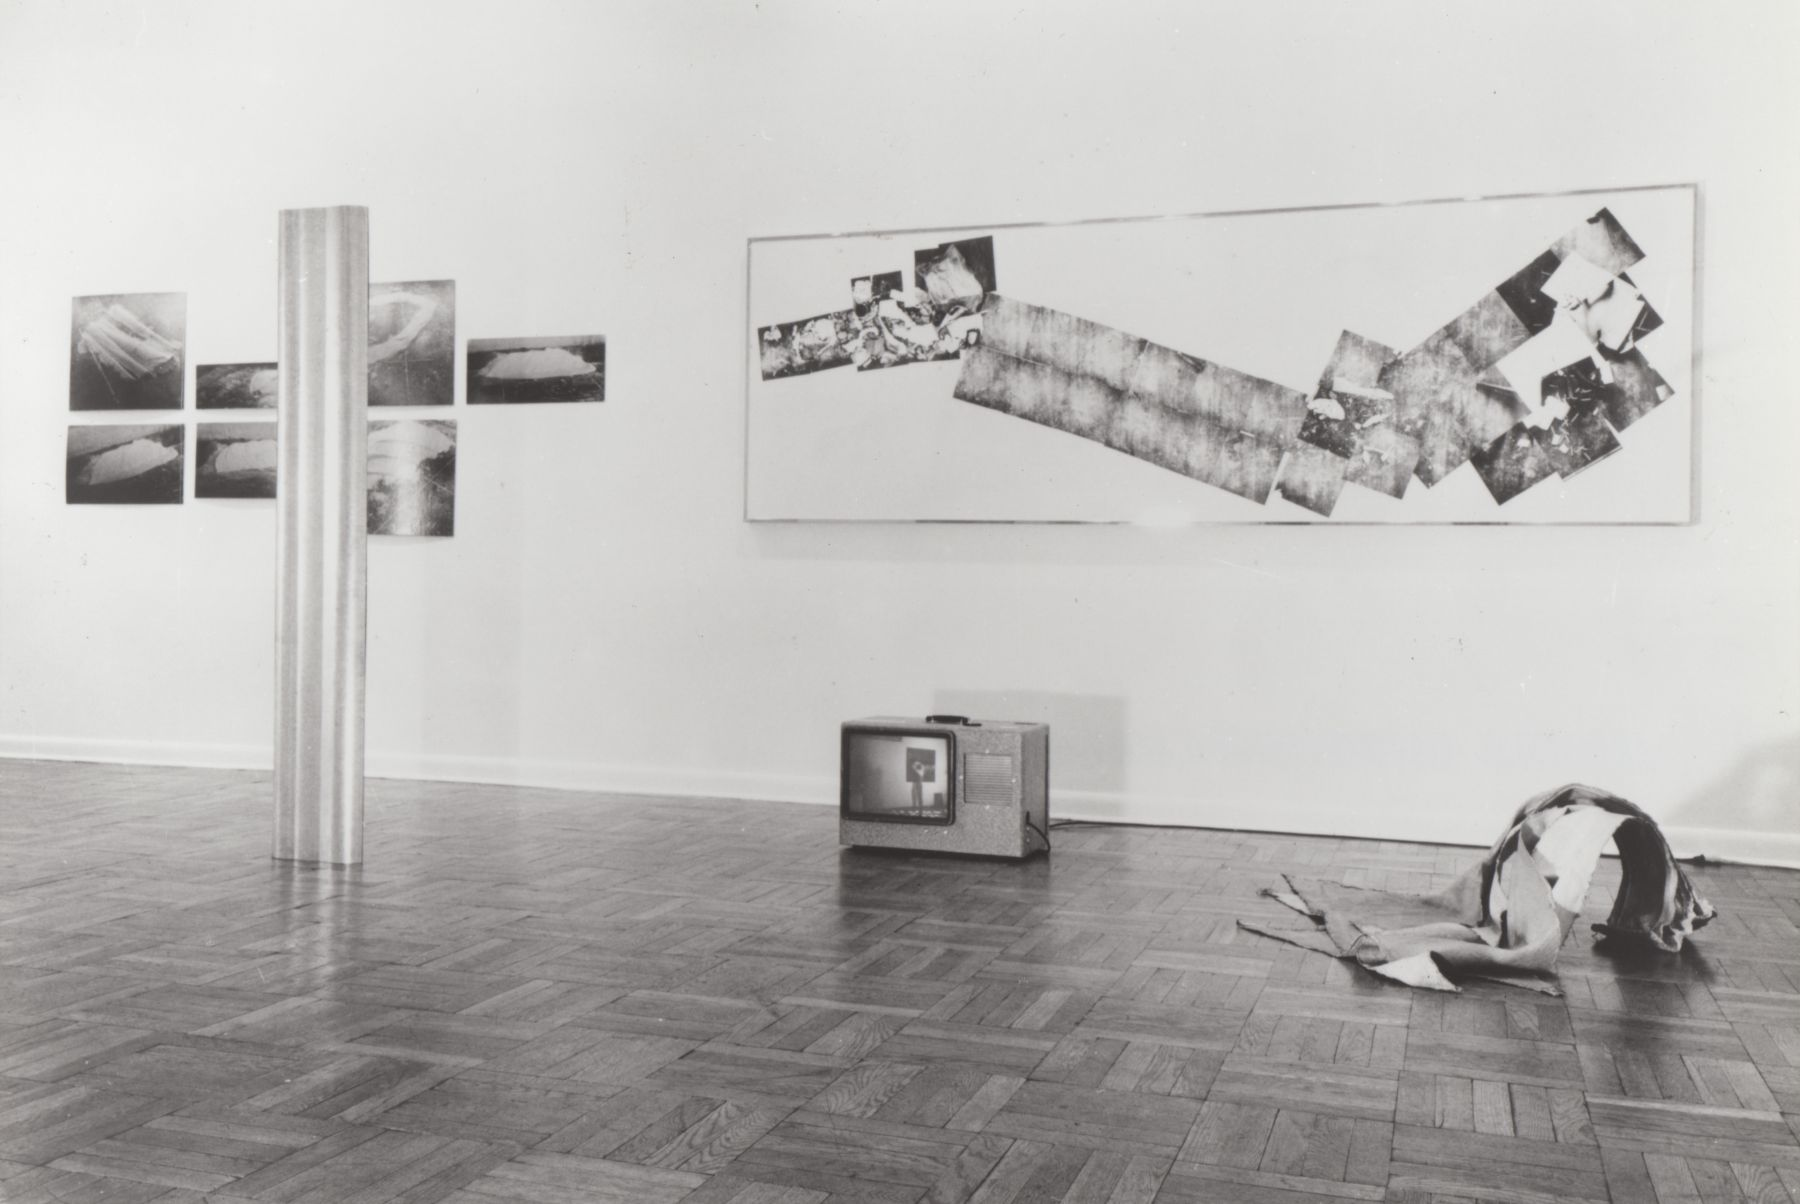 Installation view, Bruce Nauman, 4 EAST 77